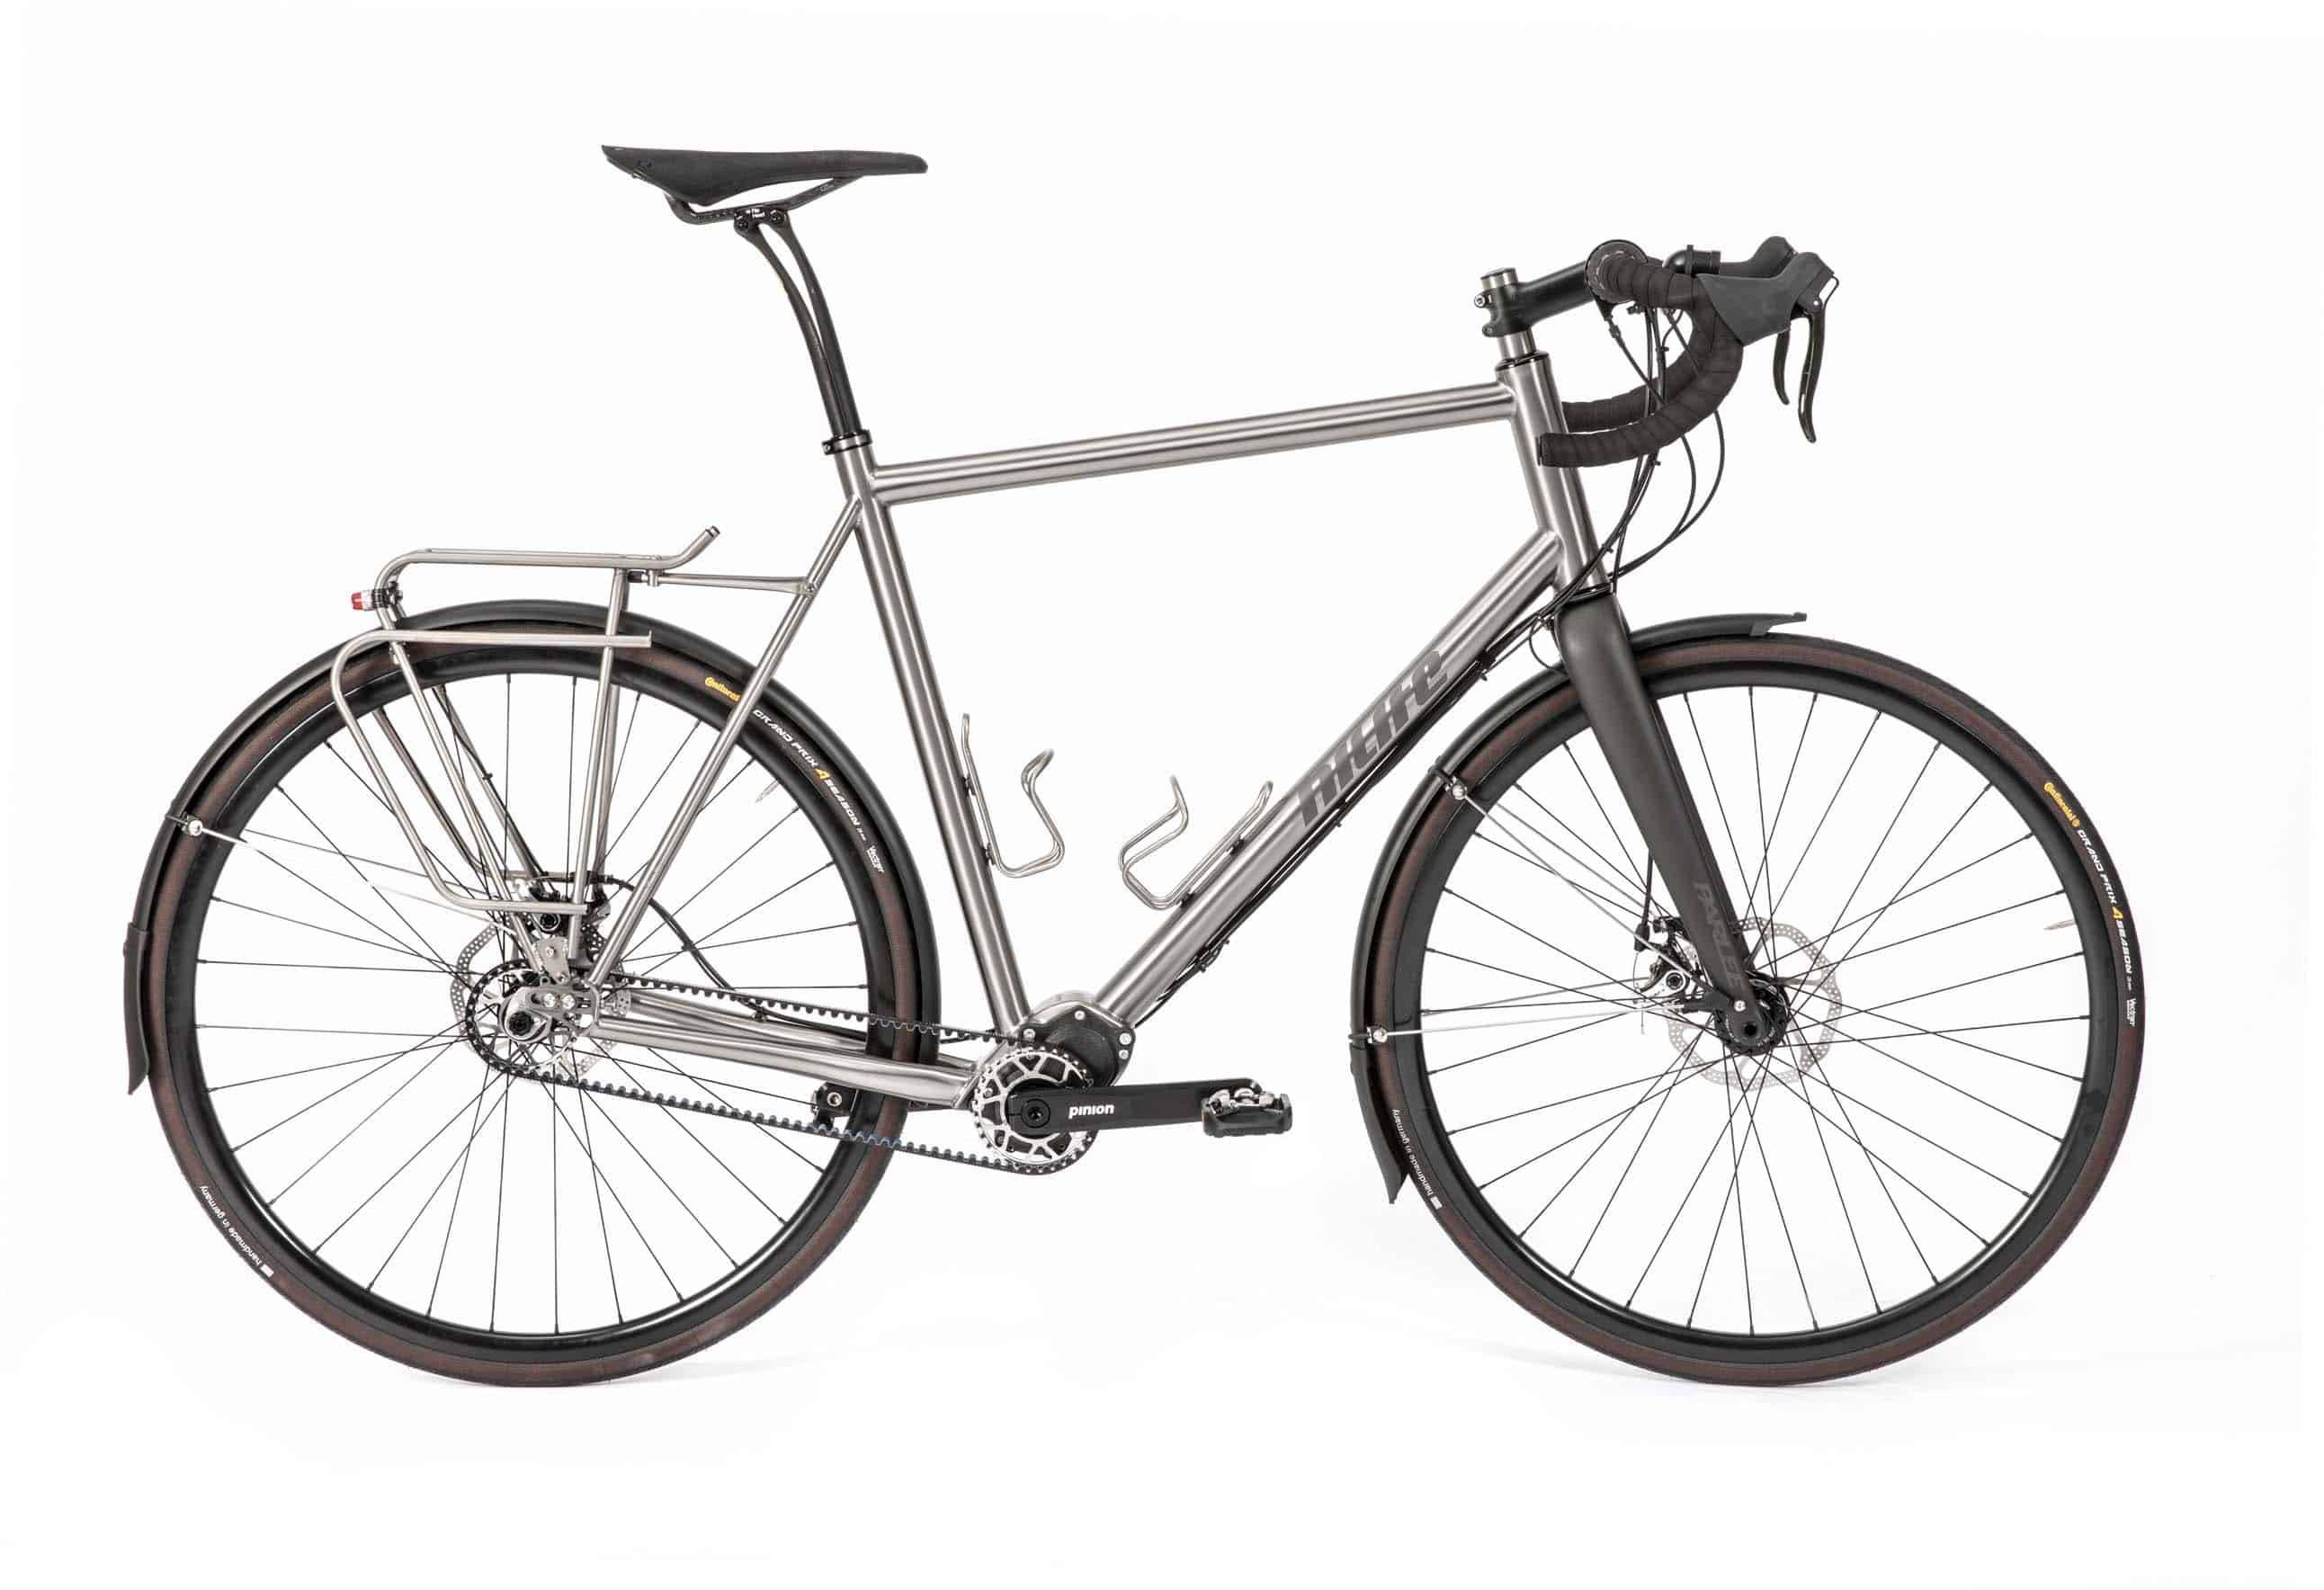 BionX PL250HT SL XL 48V 2011 bei HILITE-Bikes